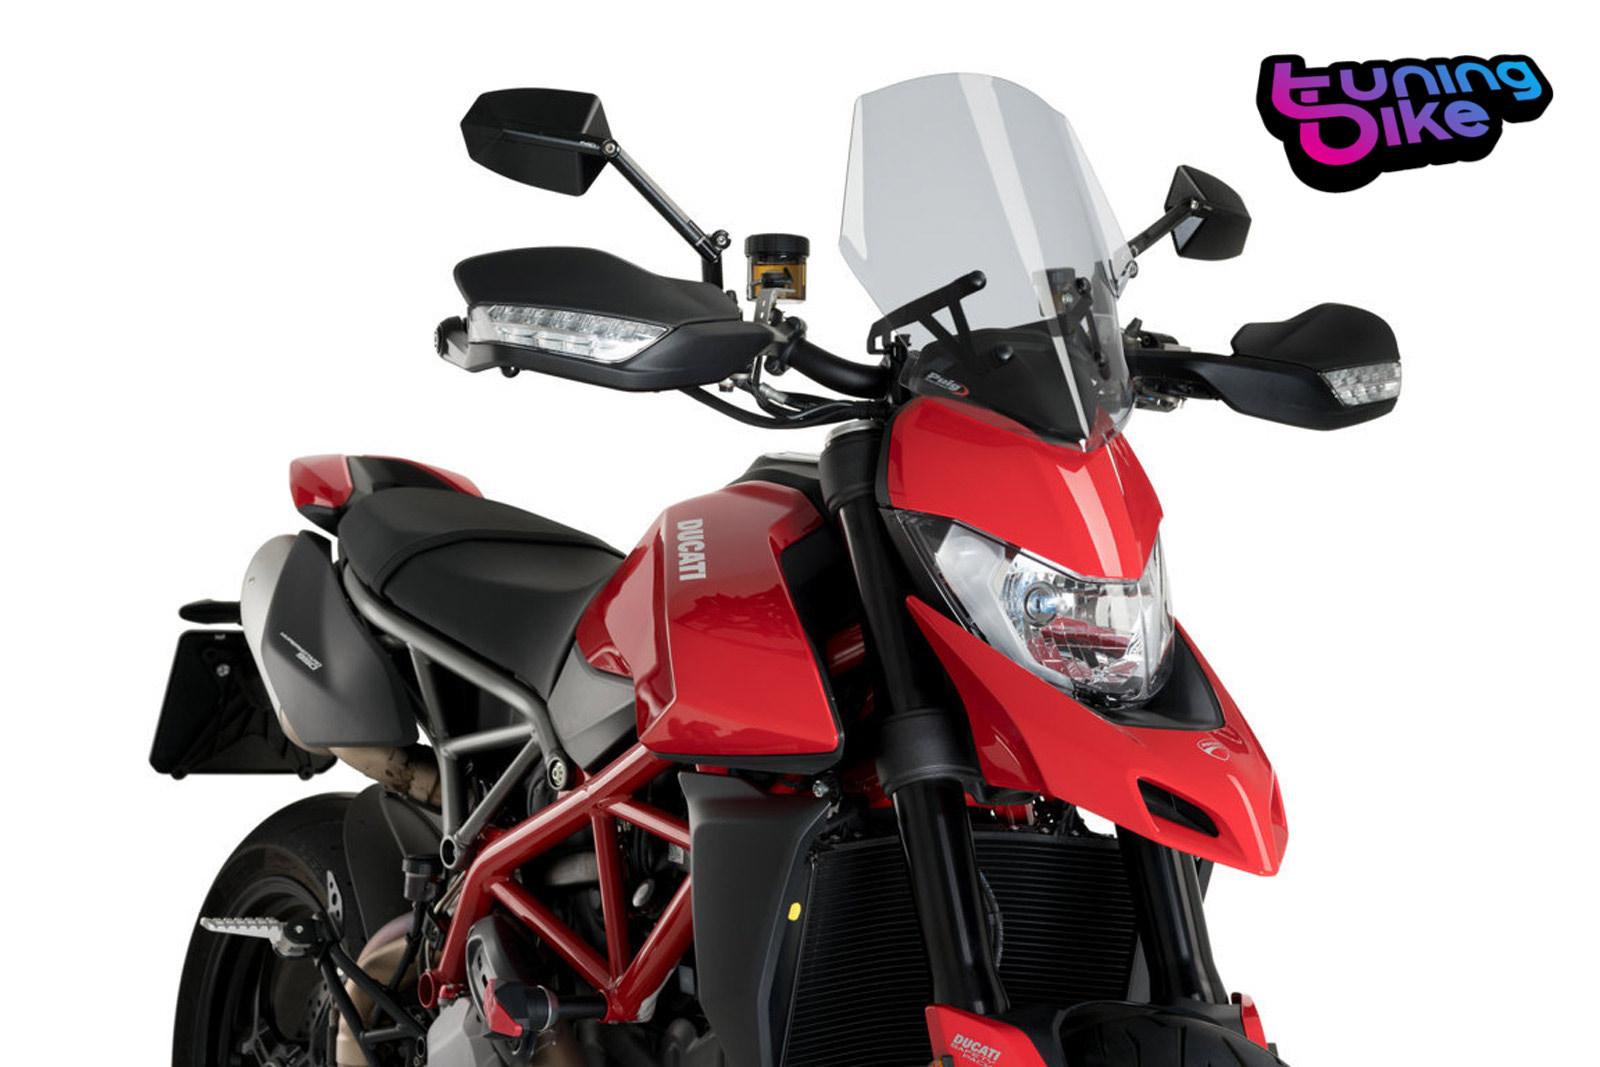 Puig - Saut-vent Naked New Generation Sport 3634 - Ducati